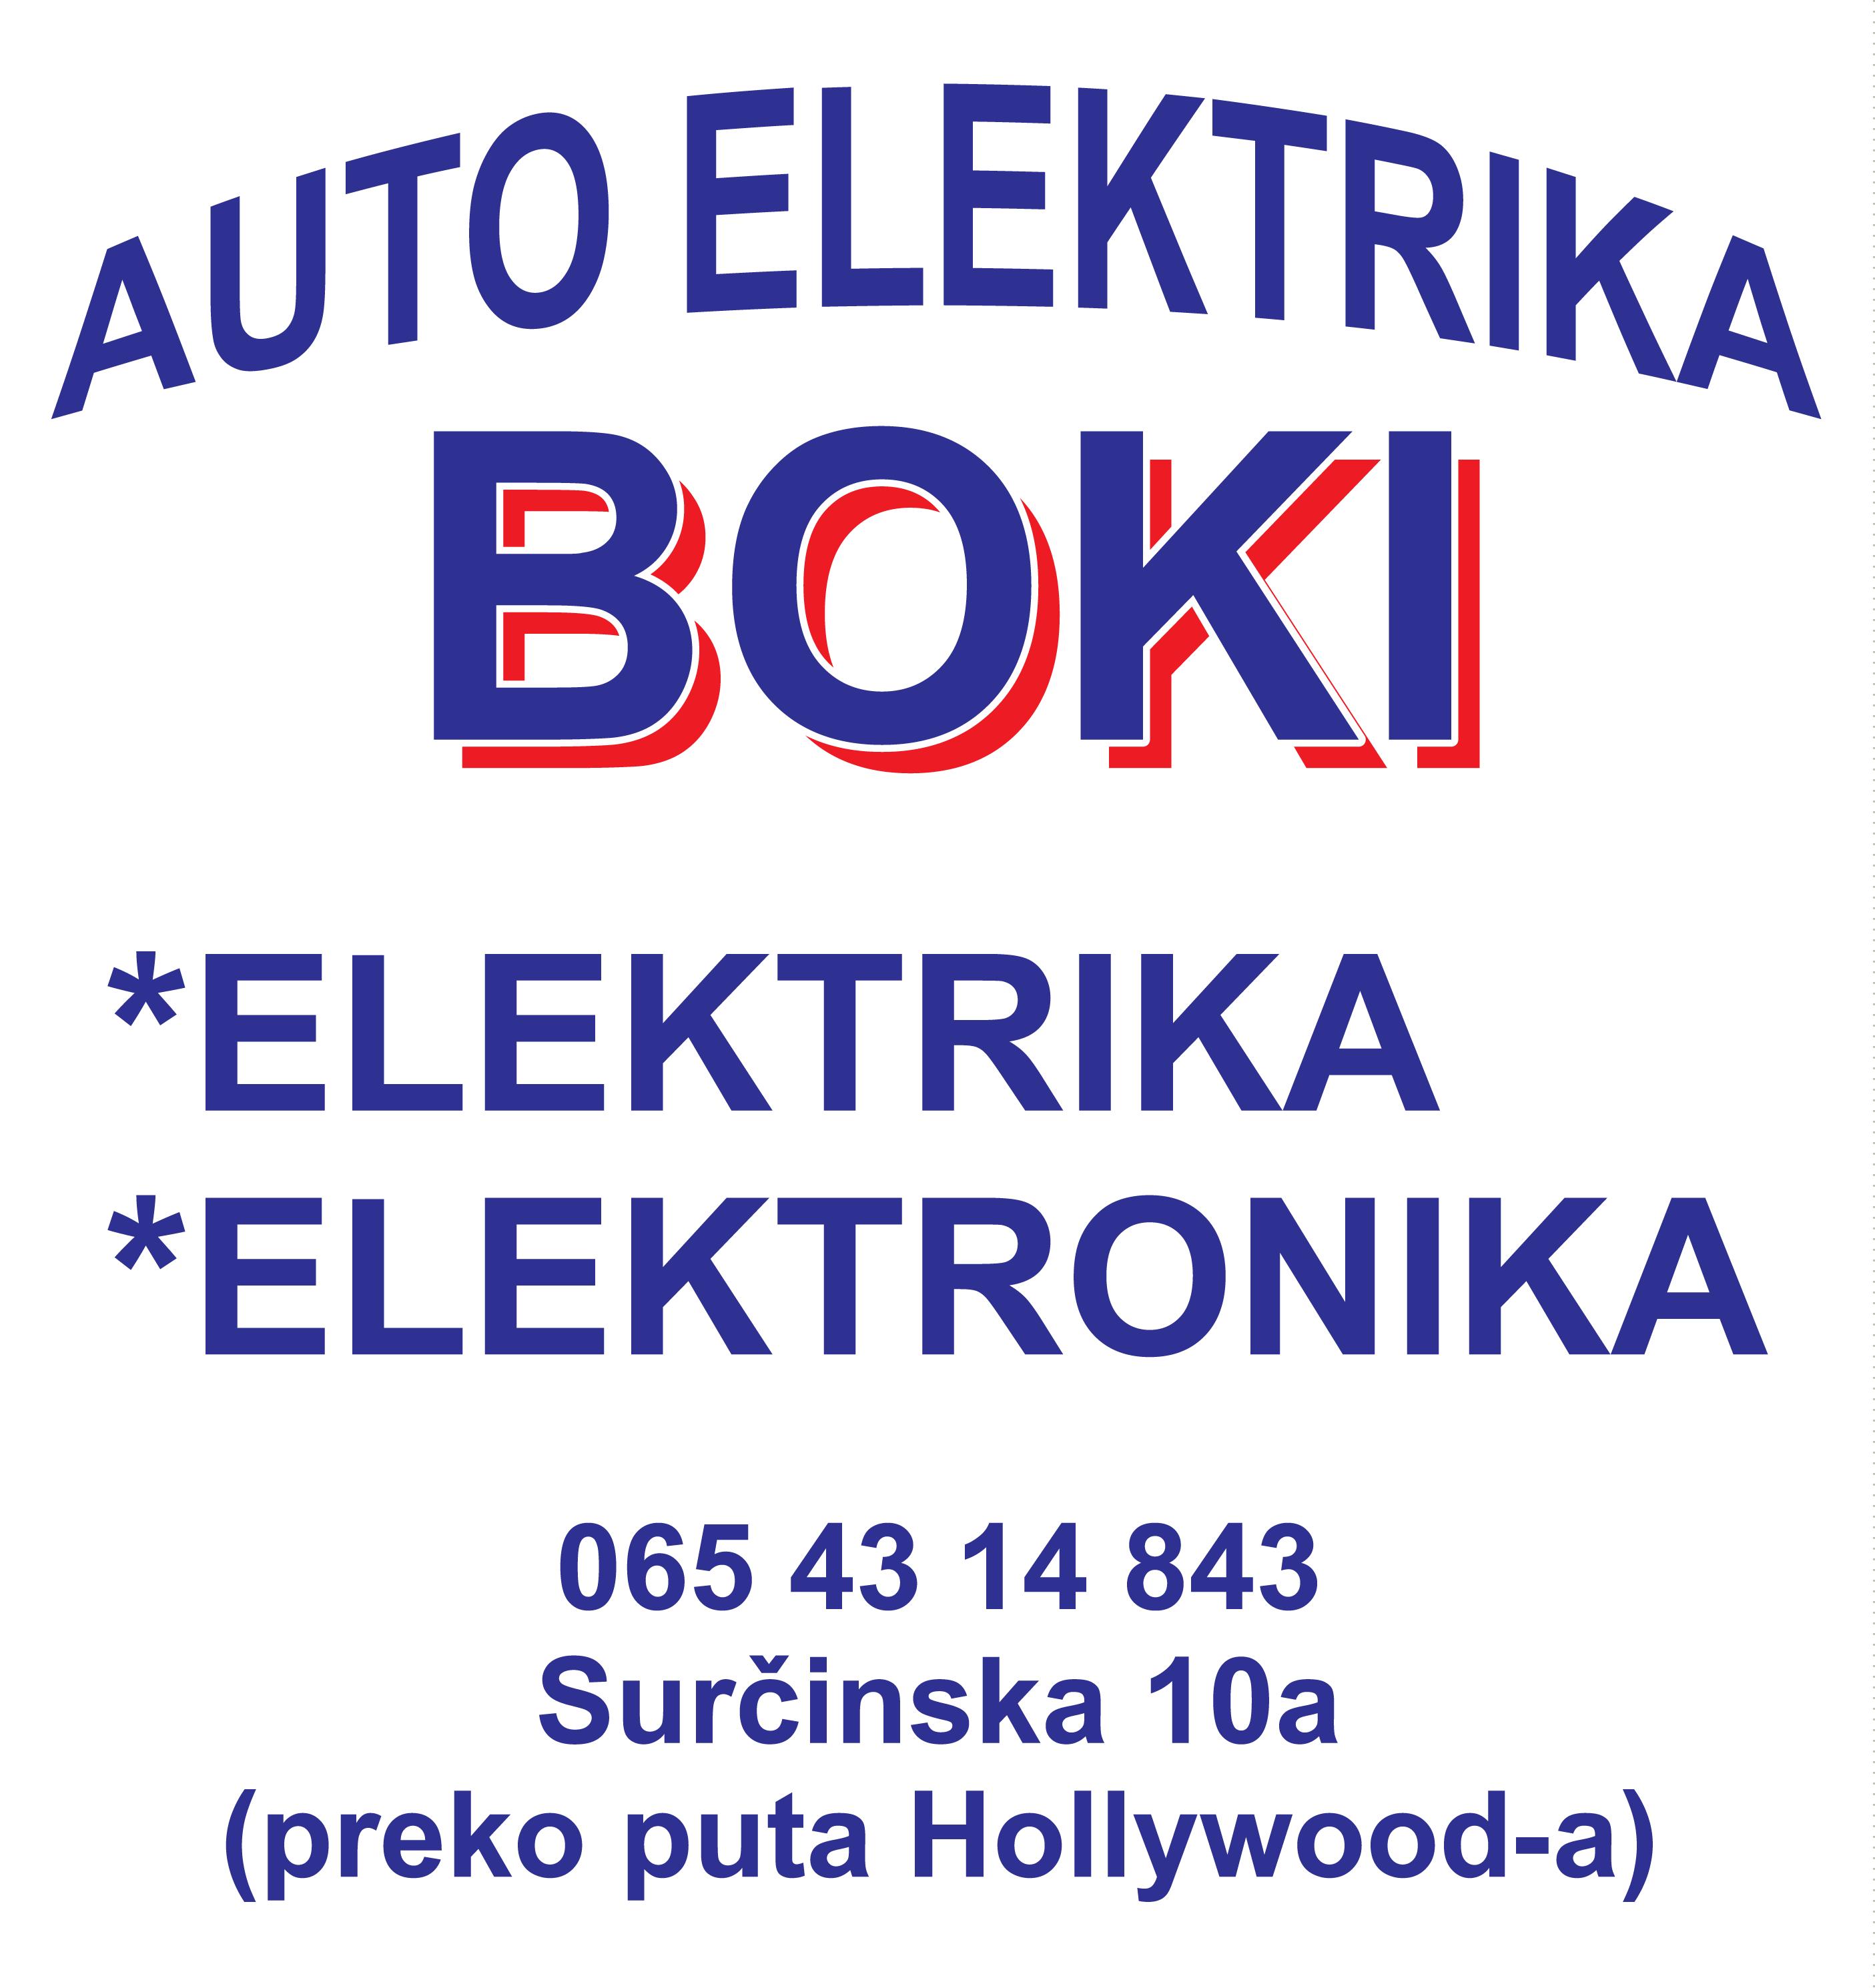 moja-baza-auto-elektrika-boki-logo